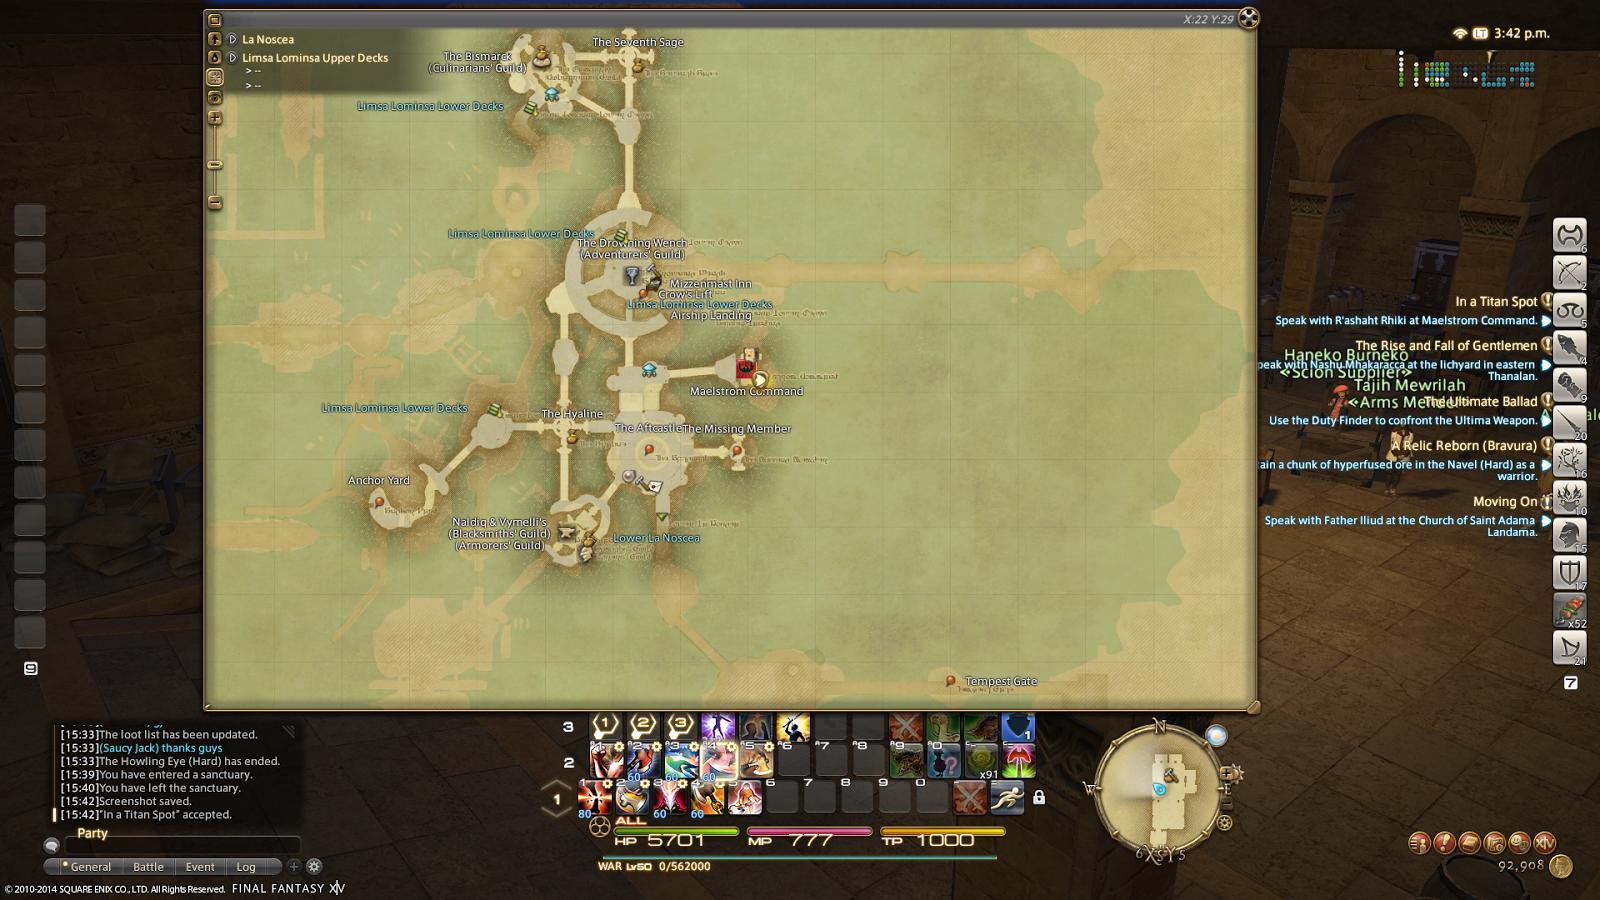 Final Fantasy XIV - A Realm Reborn: In a Titan Spot (The Navel Hard ...